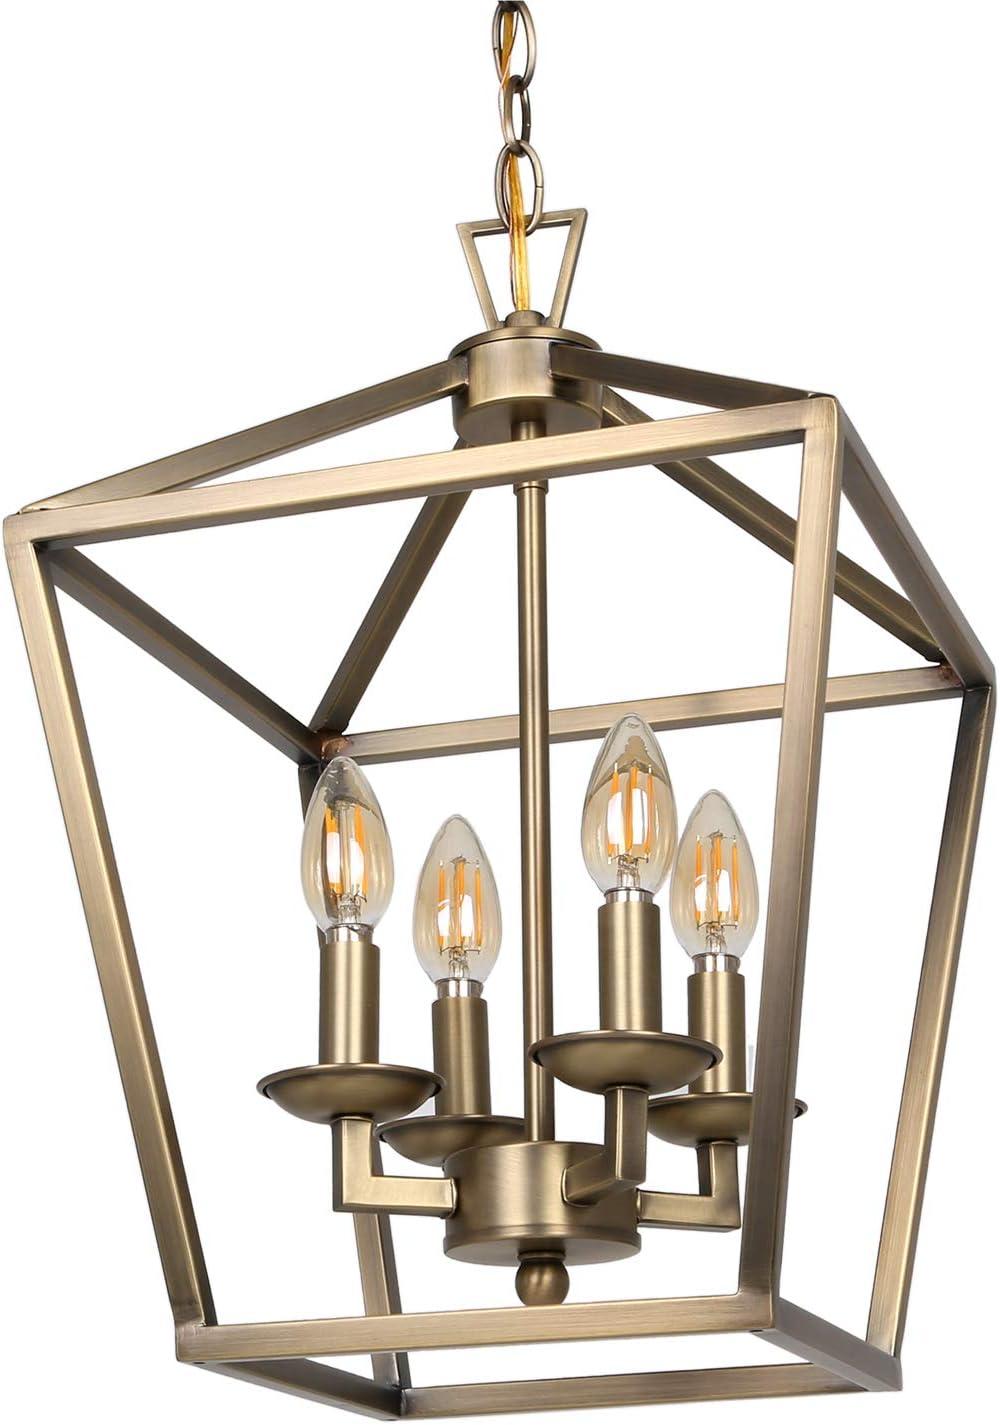 "Hykolity 4-Light Chandelier Ceiling Light Fixture, Metal Lantern Pendant Lighting for Hallway, Entryway and Dinning Room, 18"" H x 12"" W, Soft Gold Finish, ETL Listed"